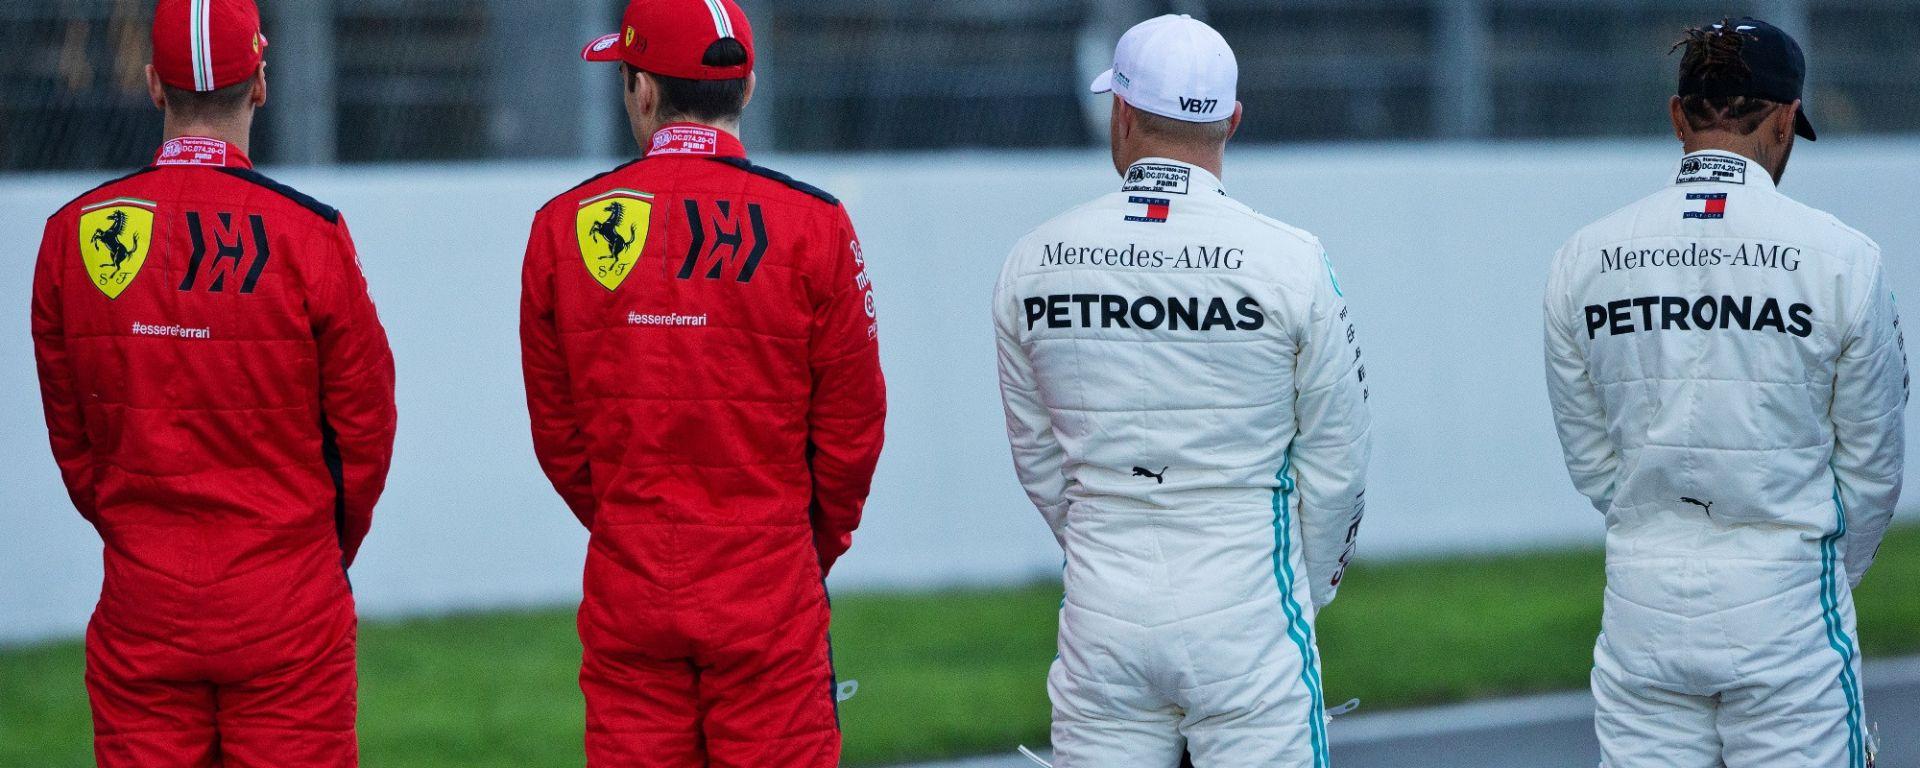 Test F1 Barcellona 2020: Sebastian Vettel e Charles Leclerc (Ferrari), Valtteri Bottas e Lewis Hamilton (Mercedes)